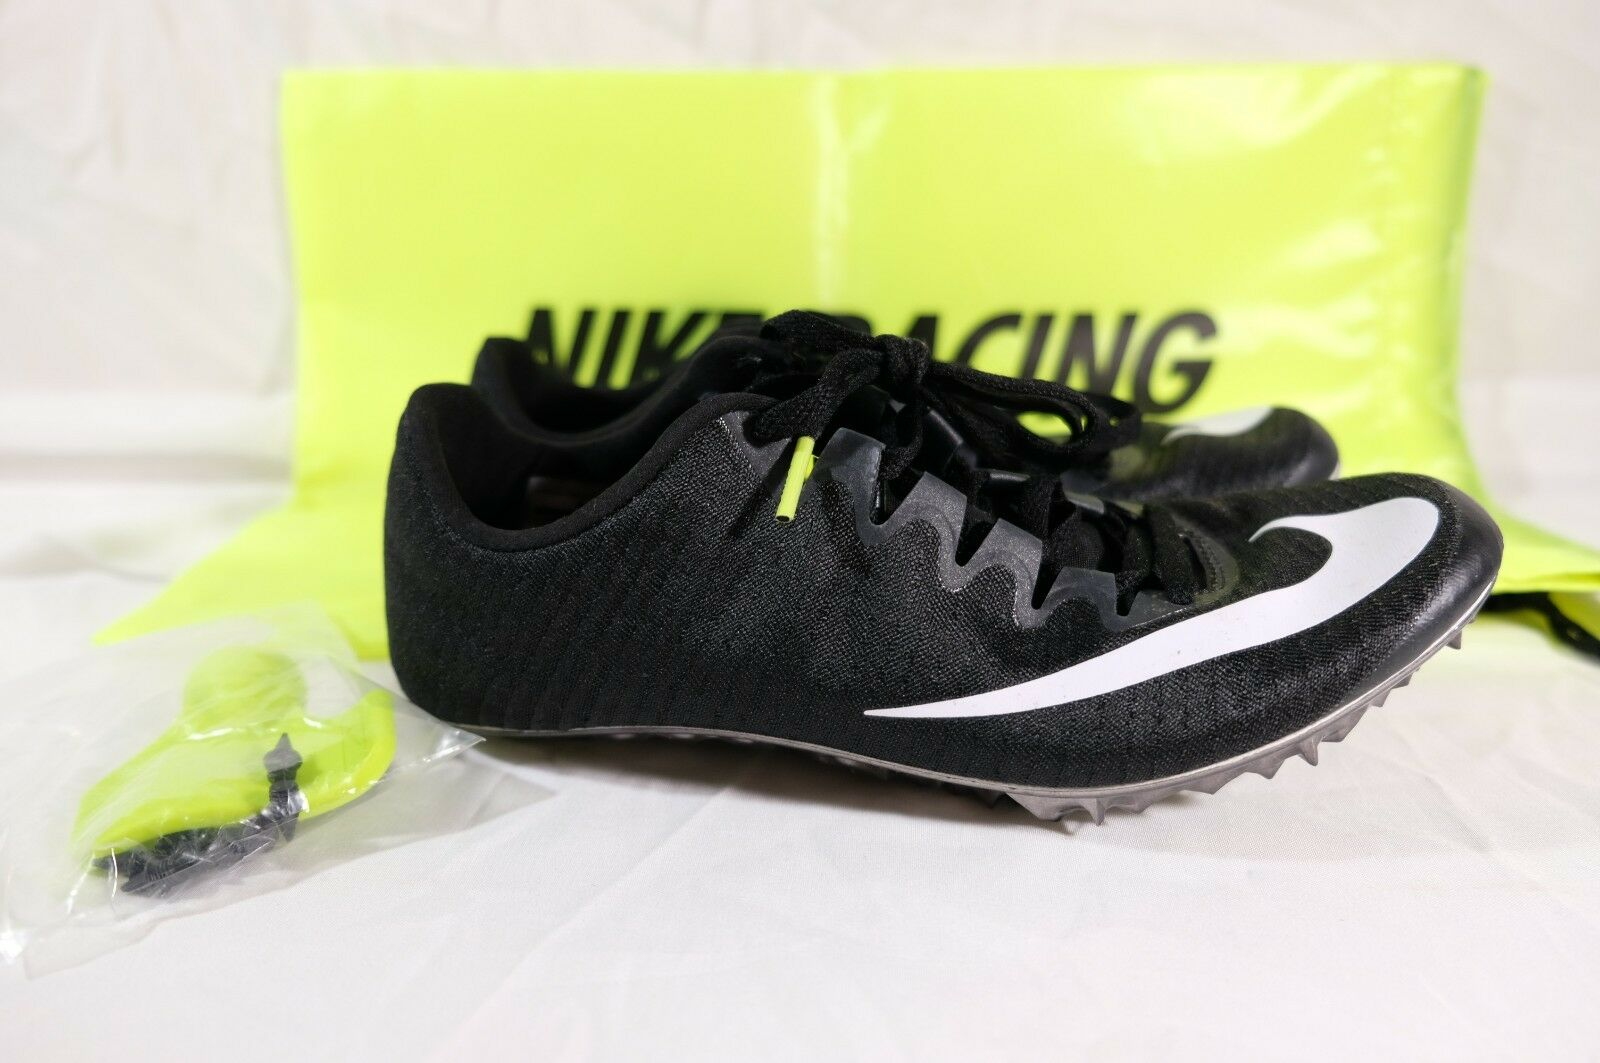 Nike Zoom Superfly Elite Atletica Spike Sz Uomini / Donne 835996-017 7,5 [6]